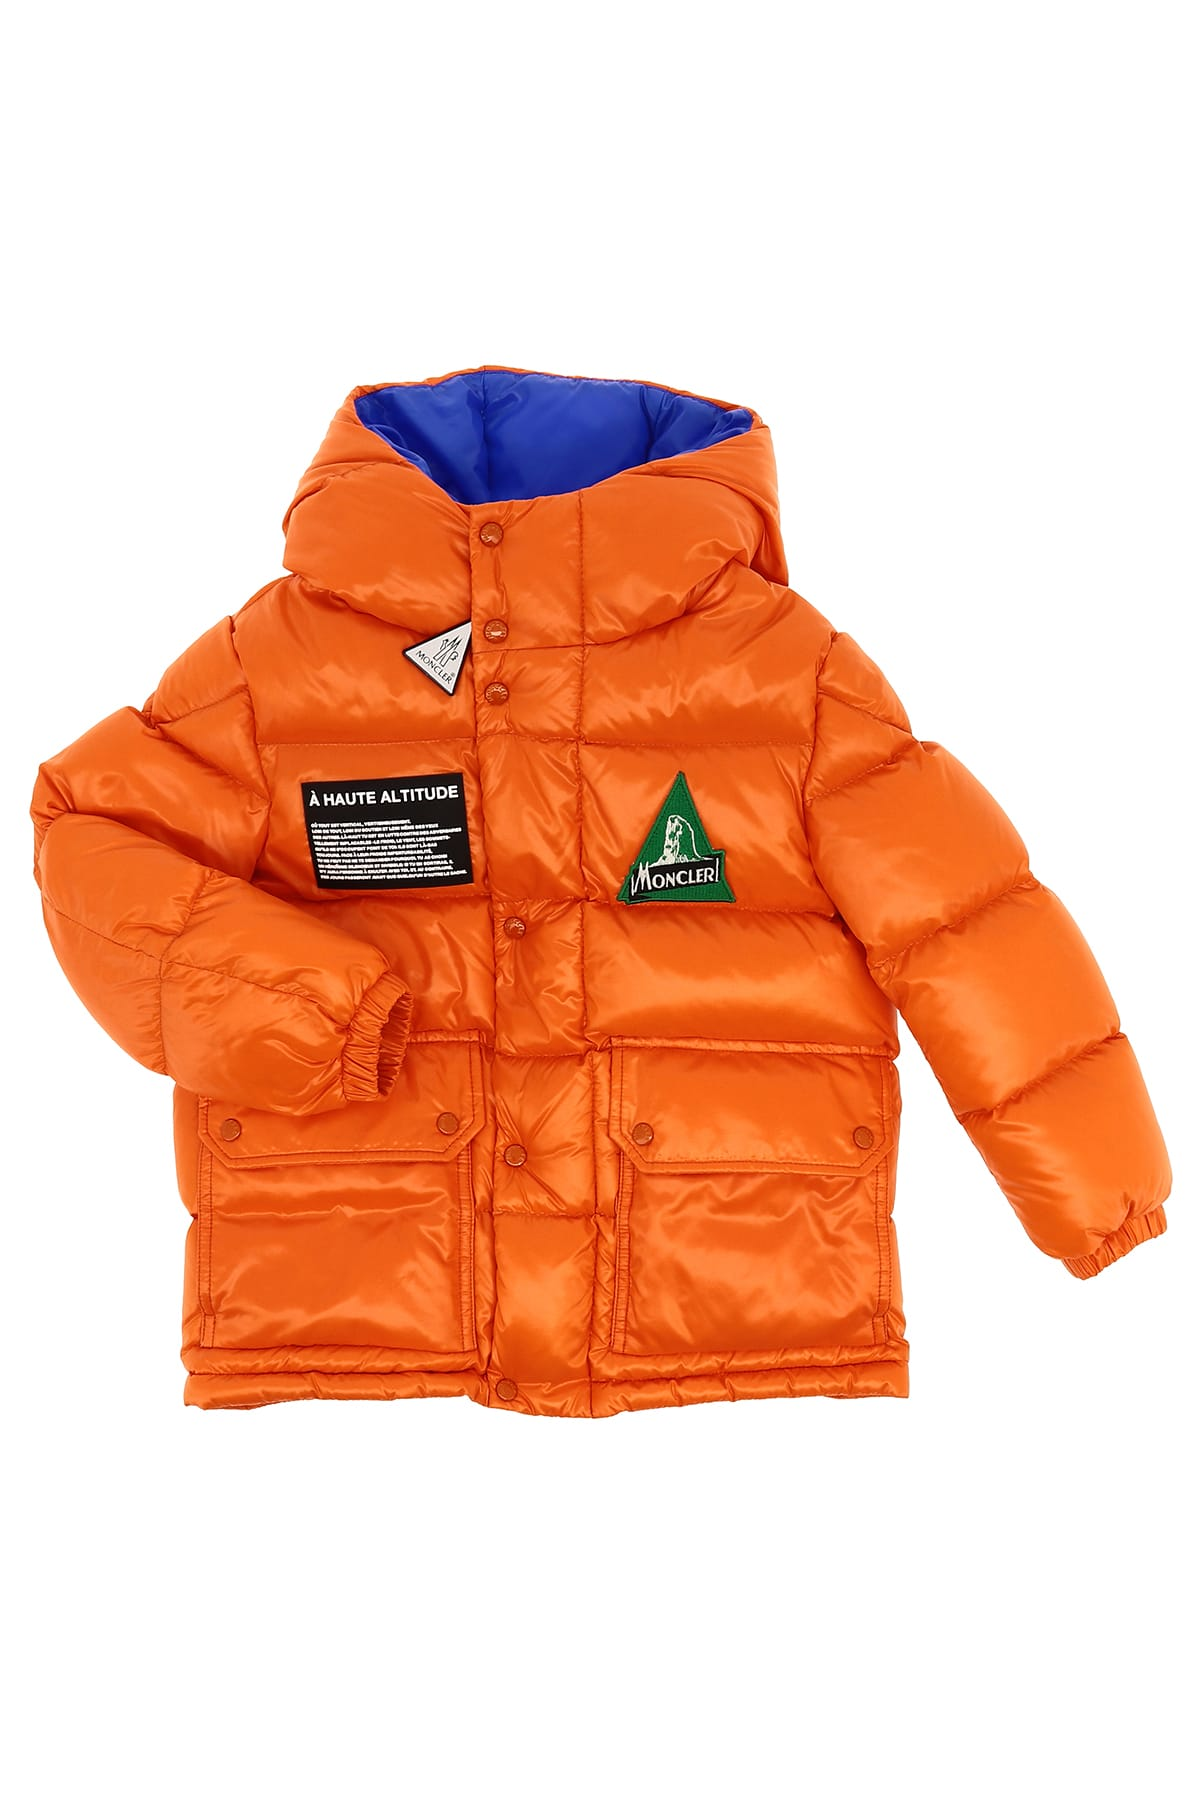 Moncler Kids' Ubaye Down Jacket In Arancione